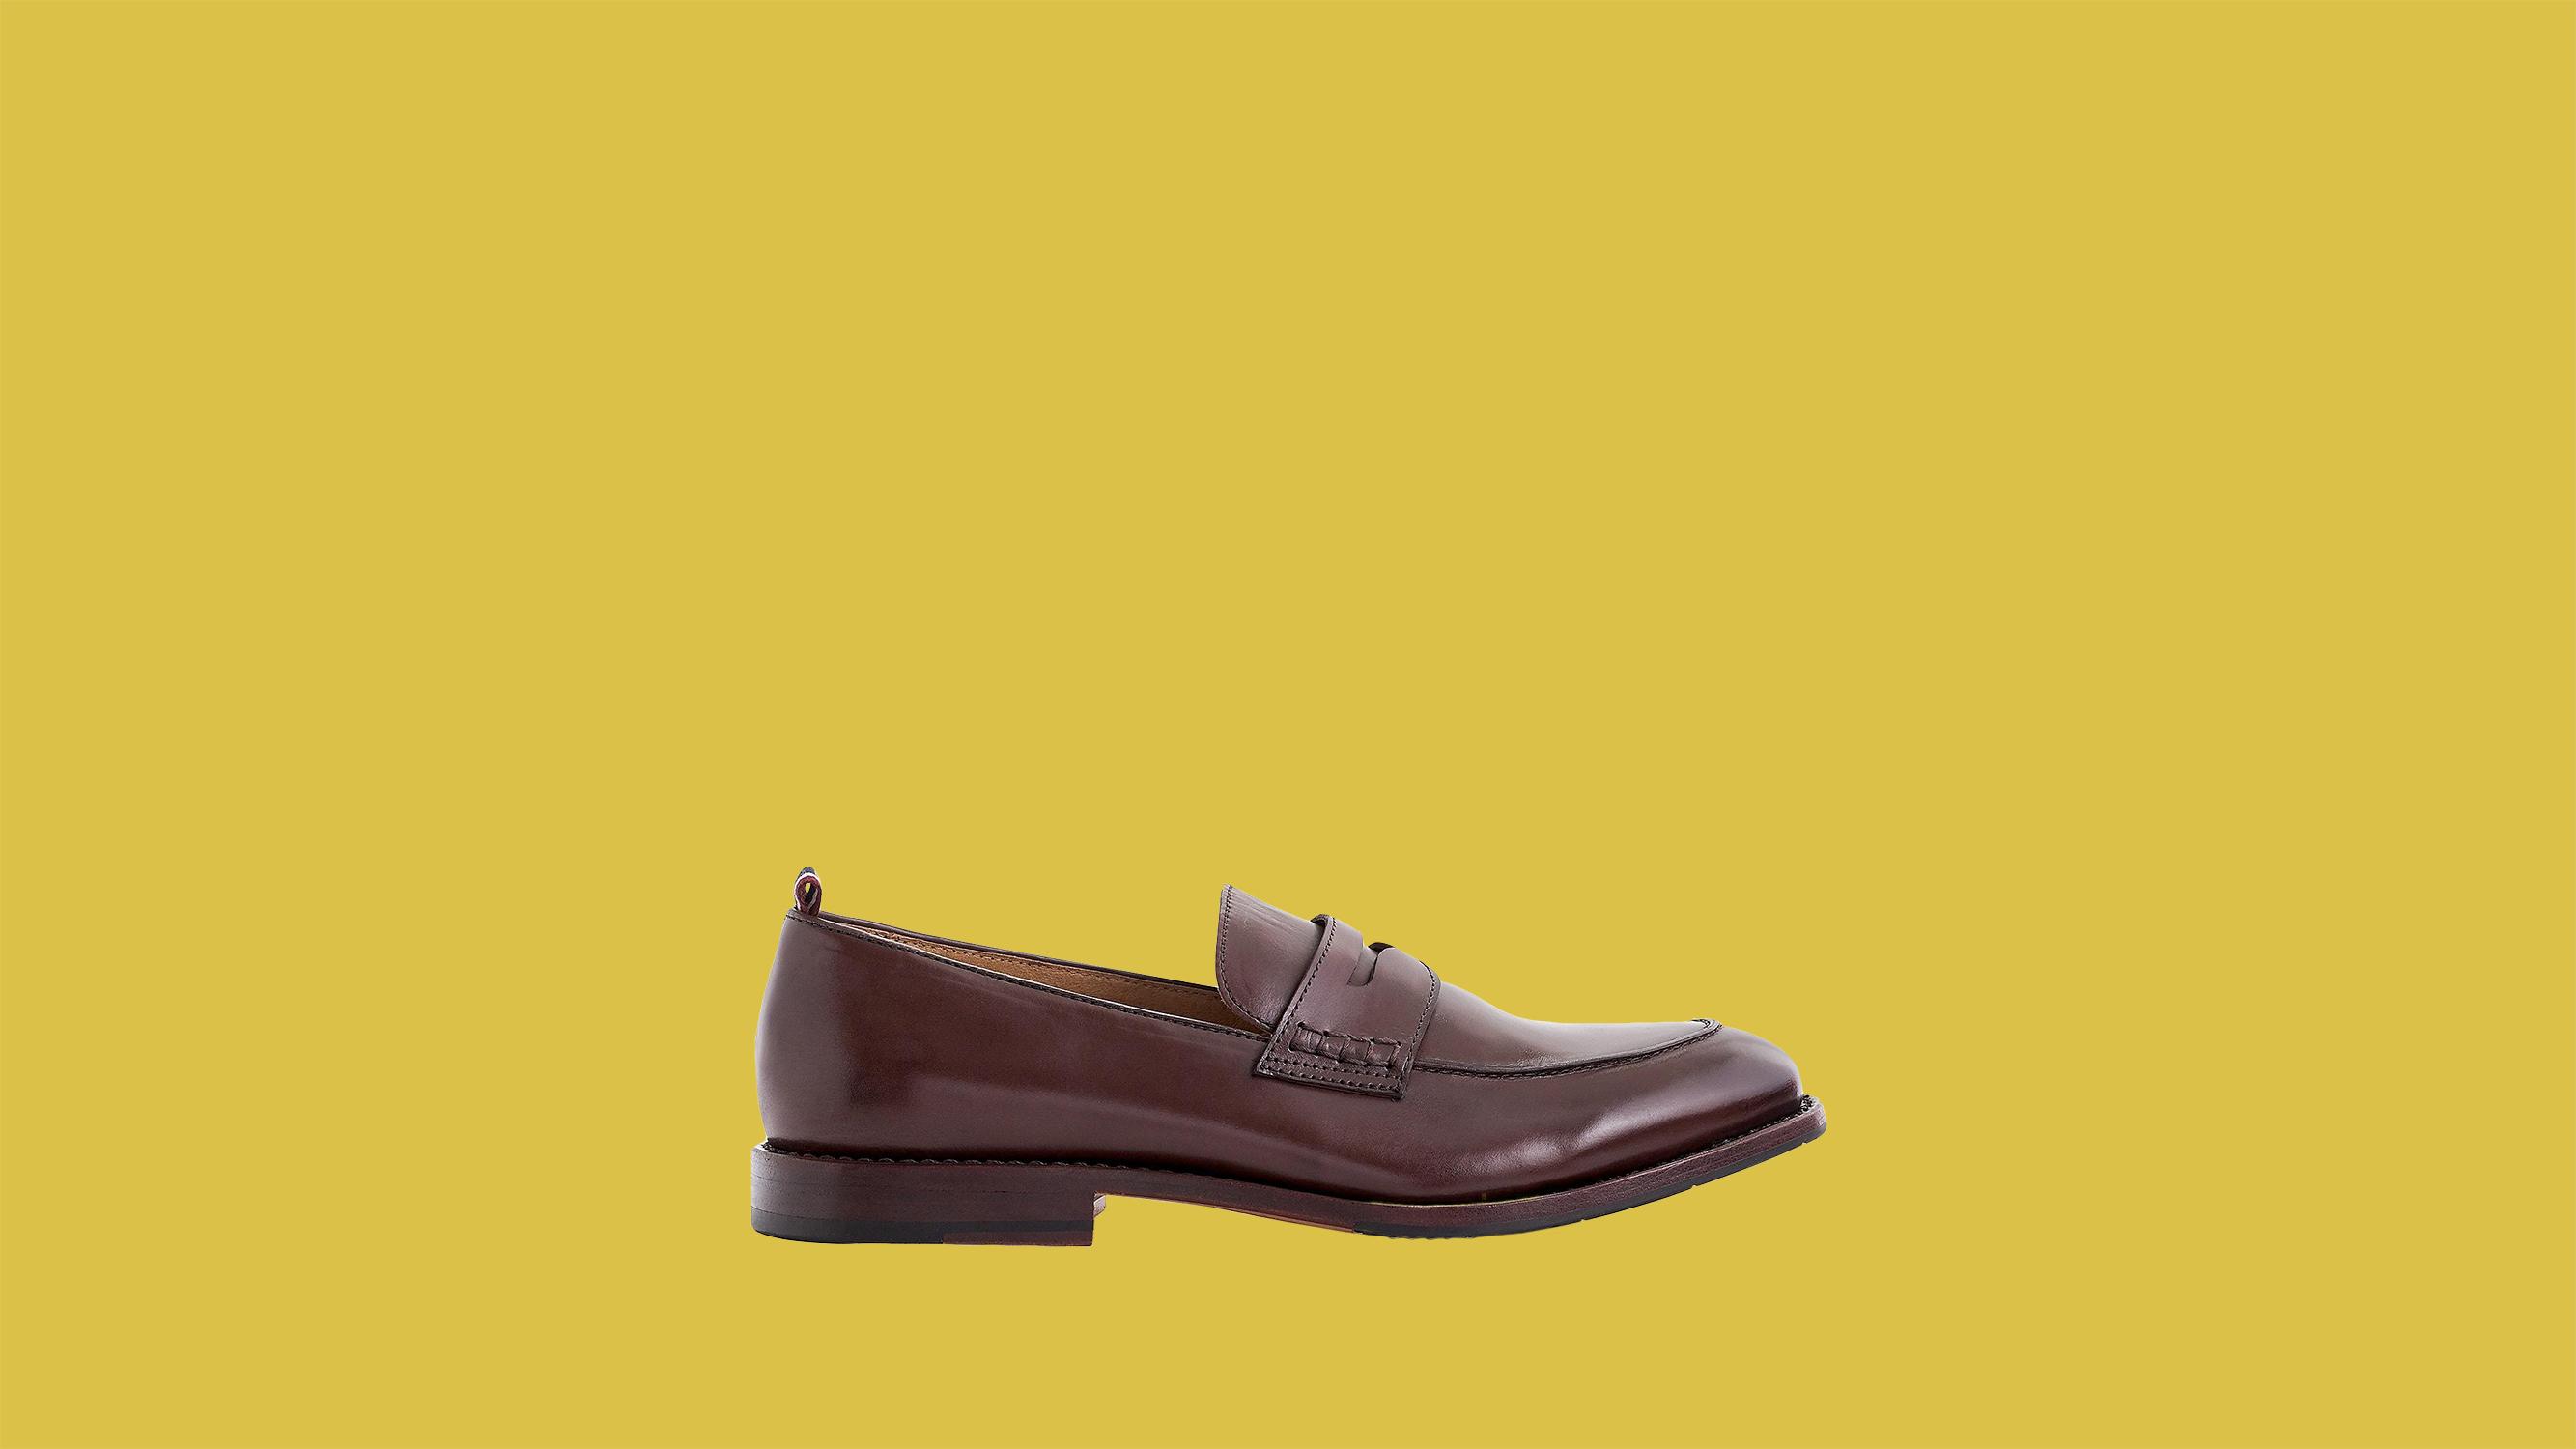 68c9bc6c7ba05 Classic Wedding Shoes for the Traditional Groom | Martha Stewart ...